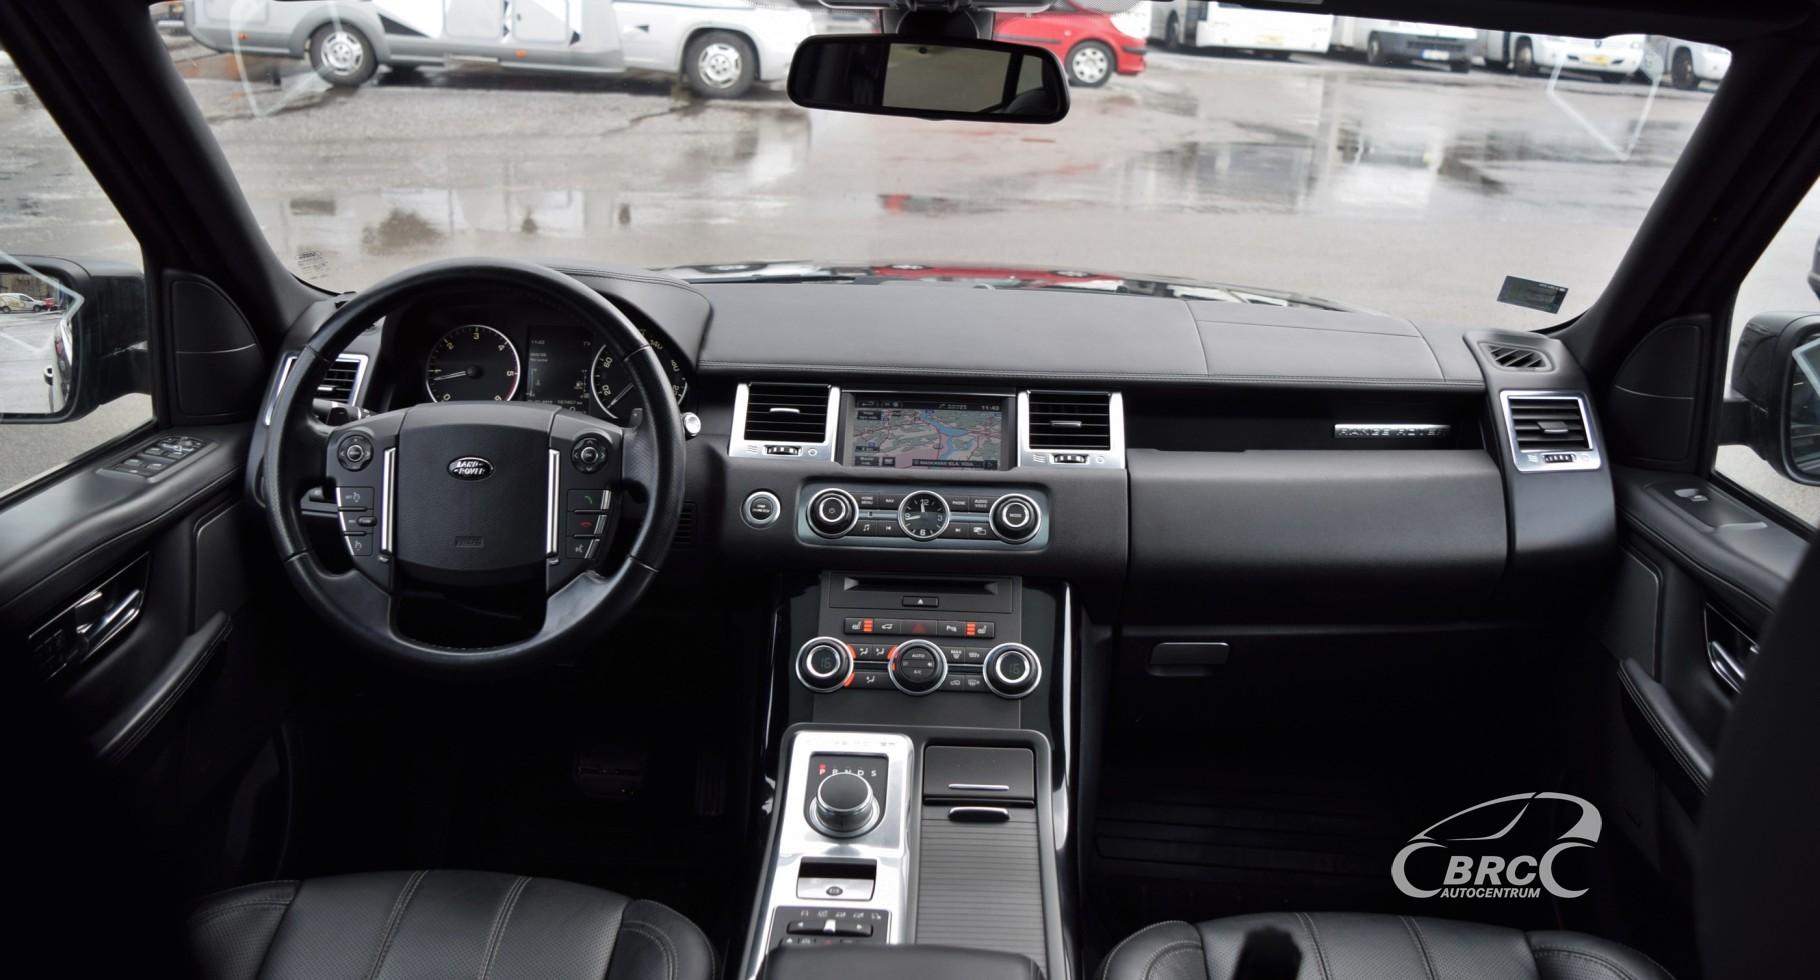 Land-Rover Range Rover Sport HSE SDV6